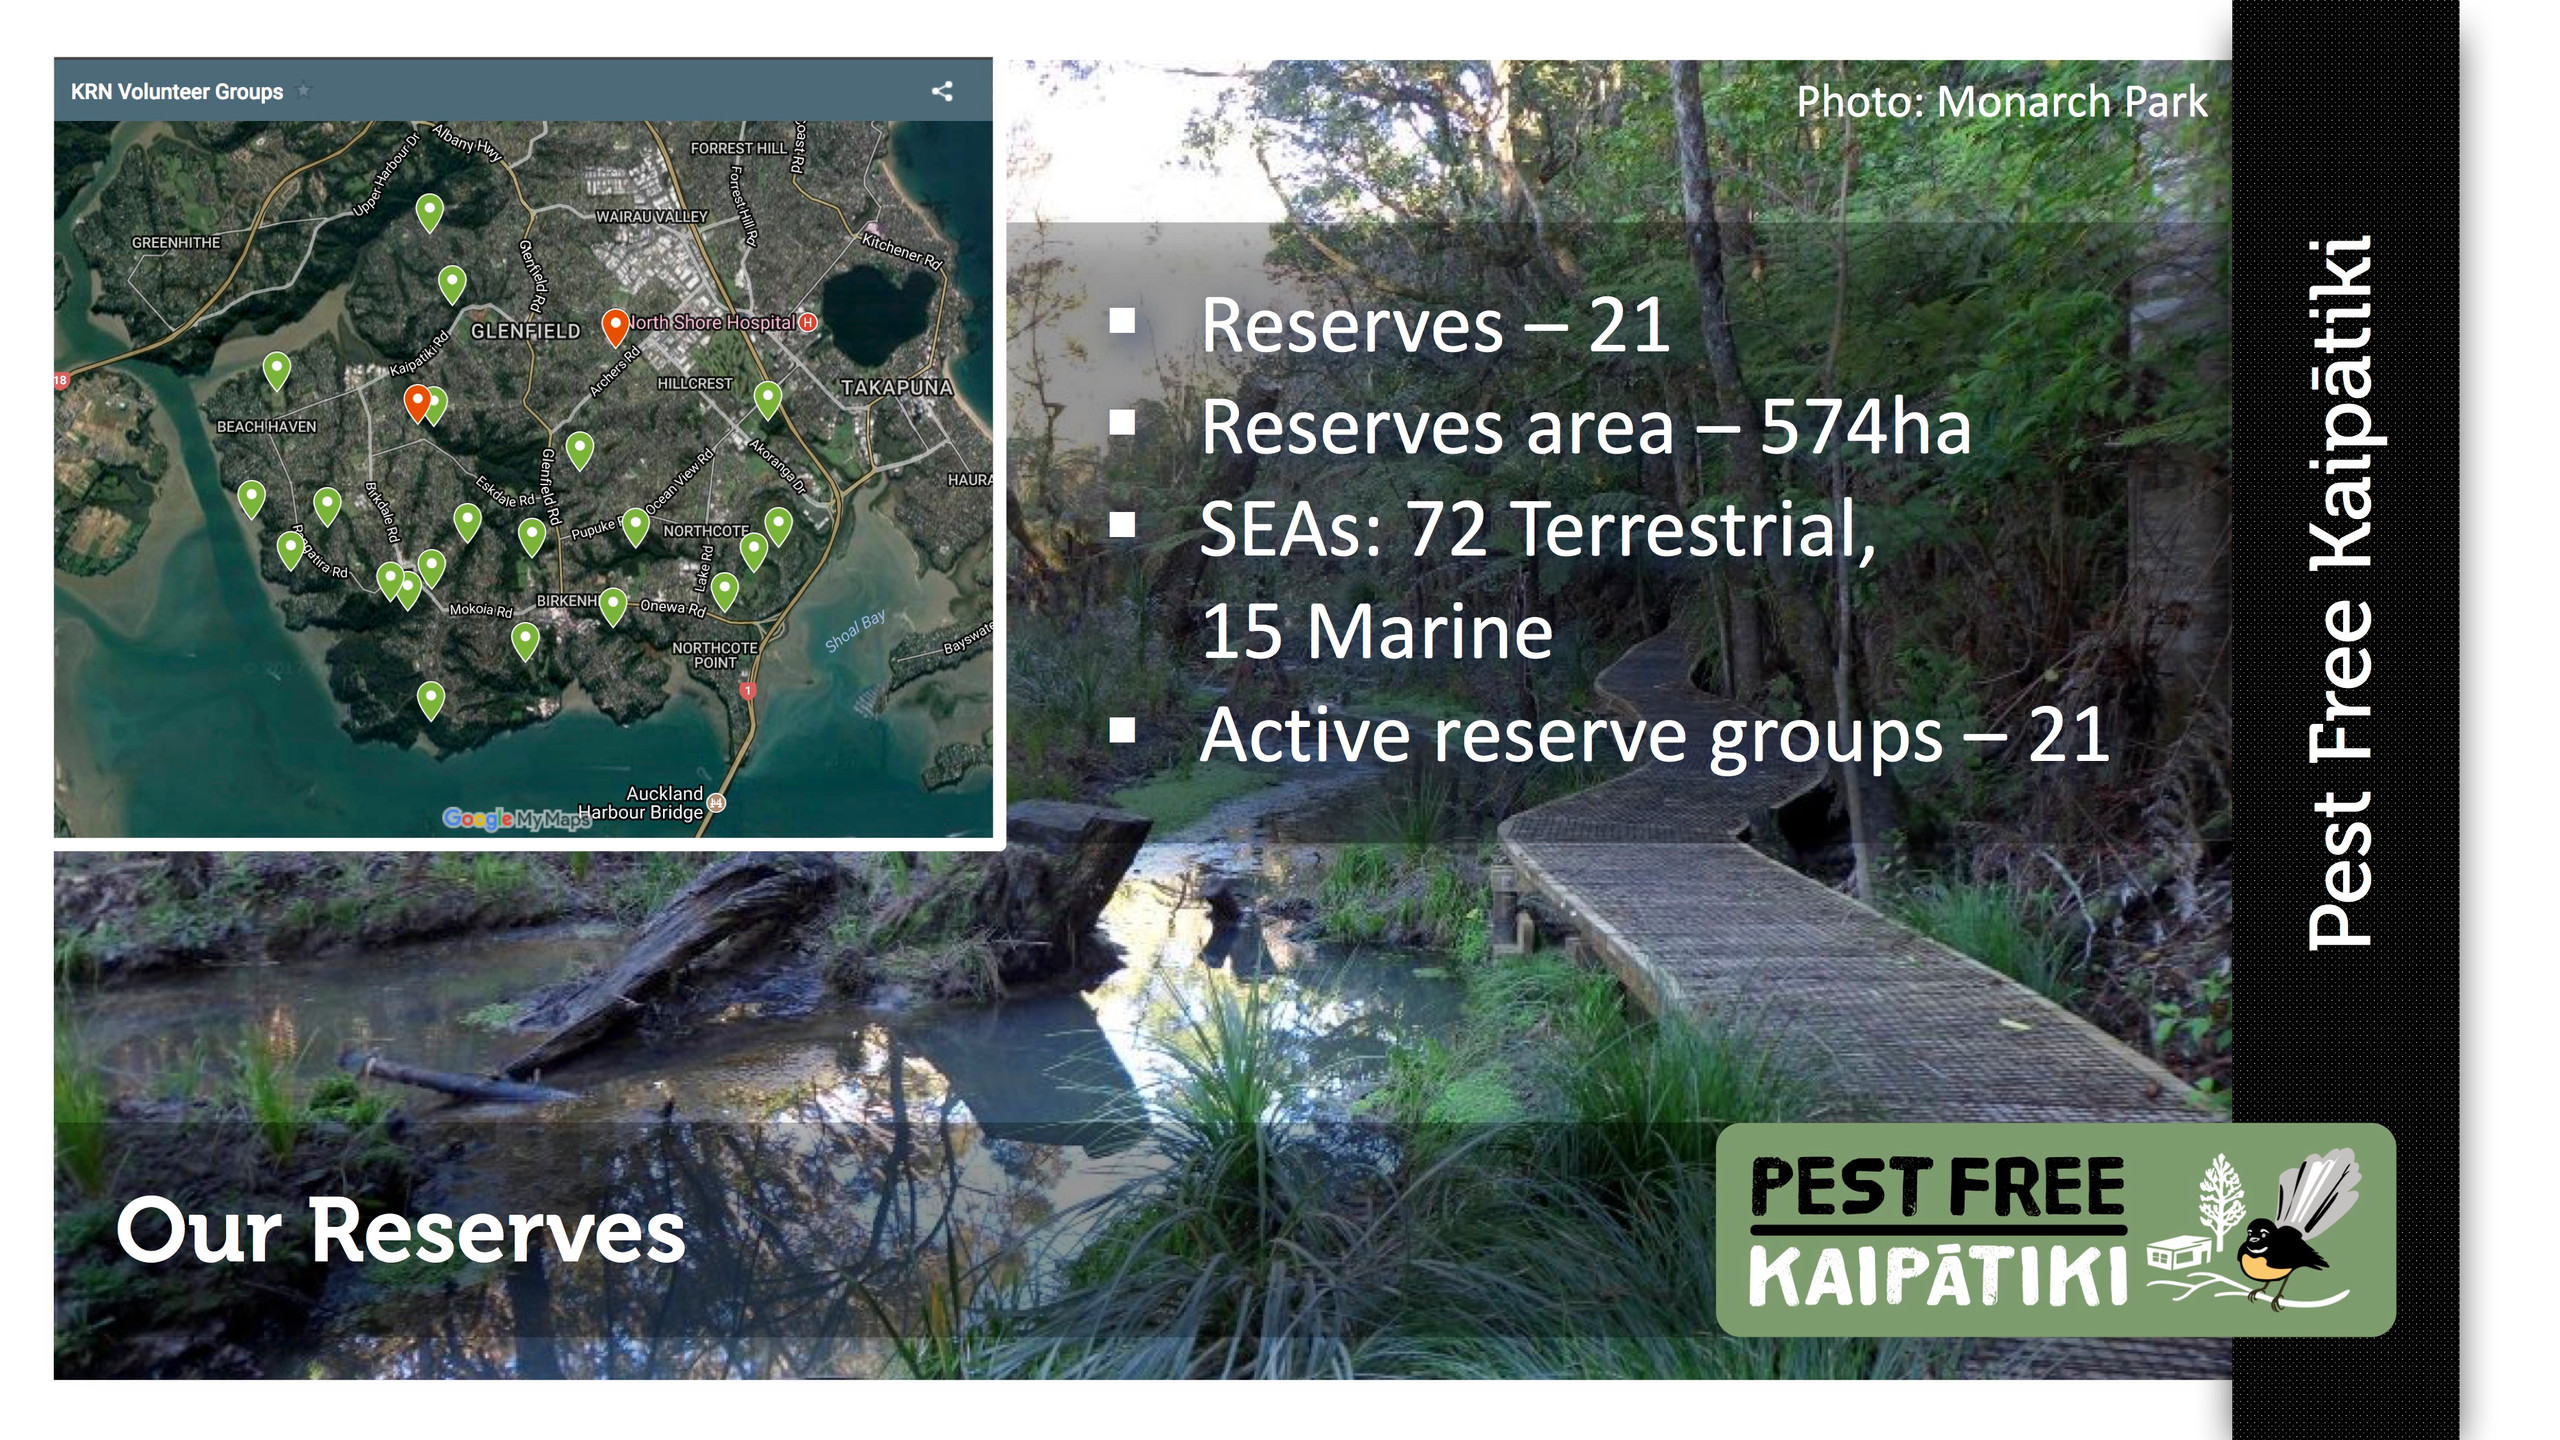 Pest Free Kaipatiki-Pestival-slide8